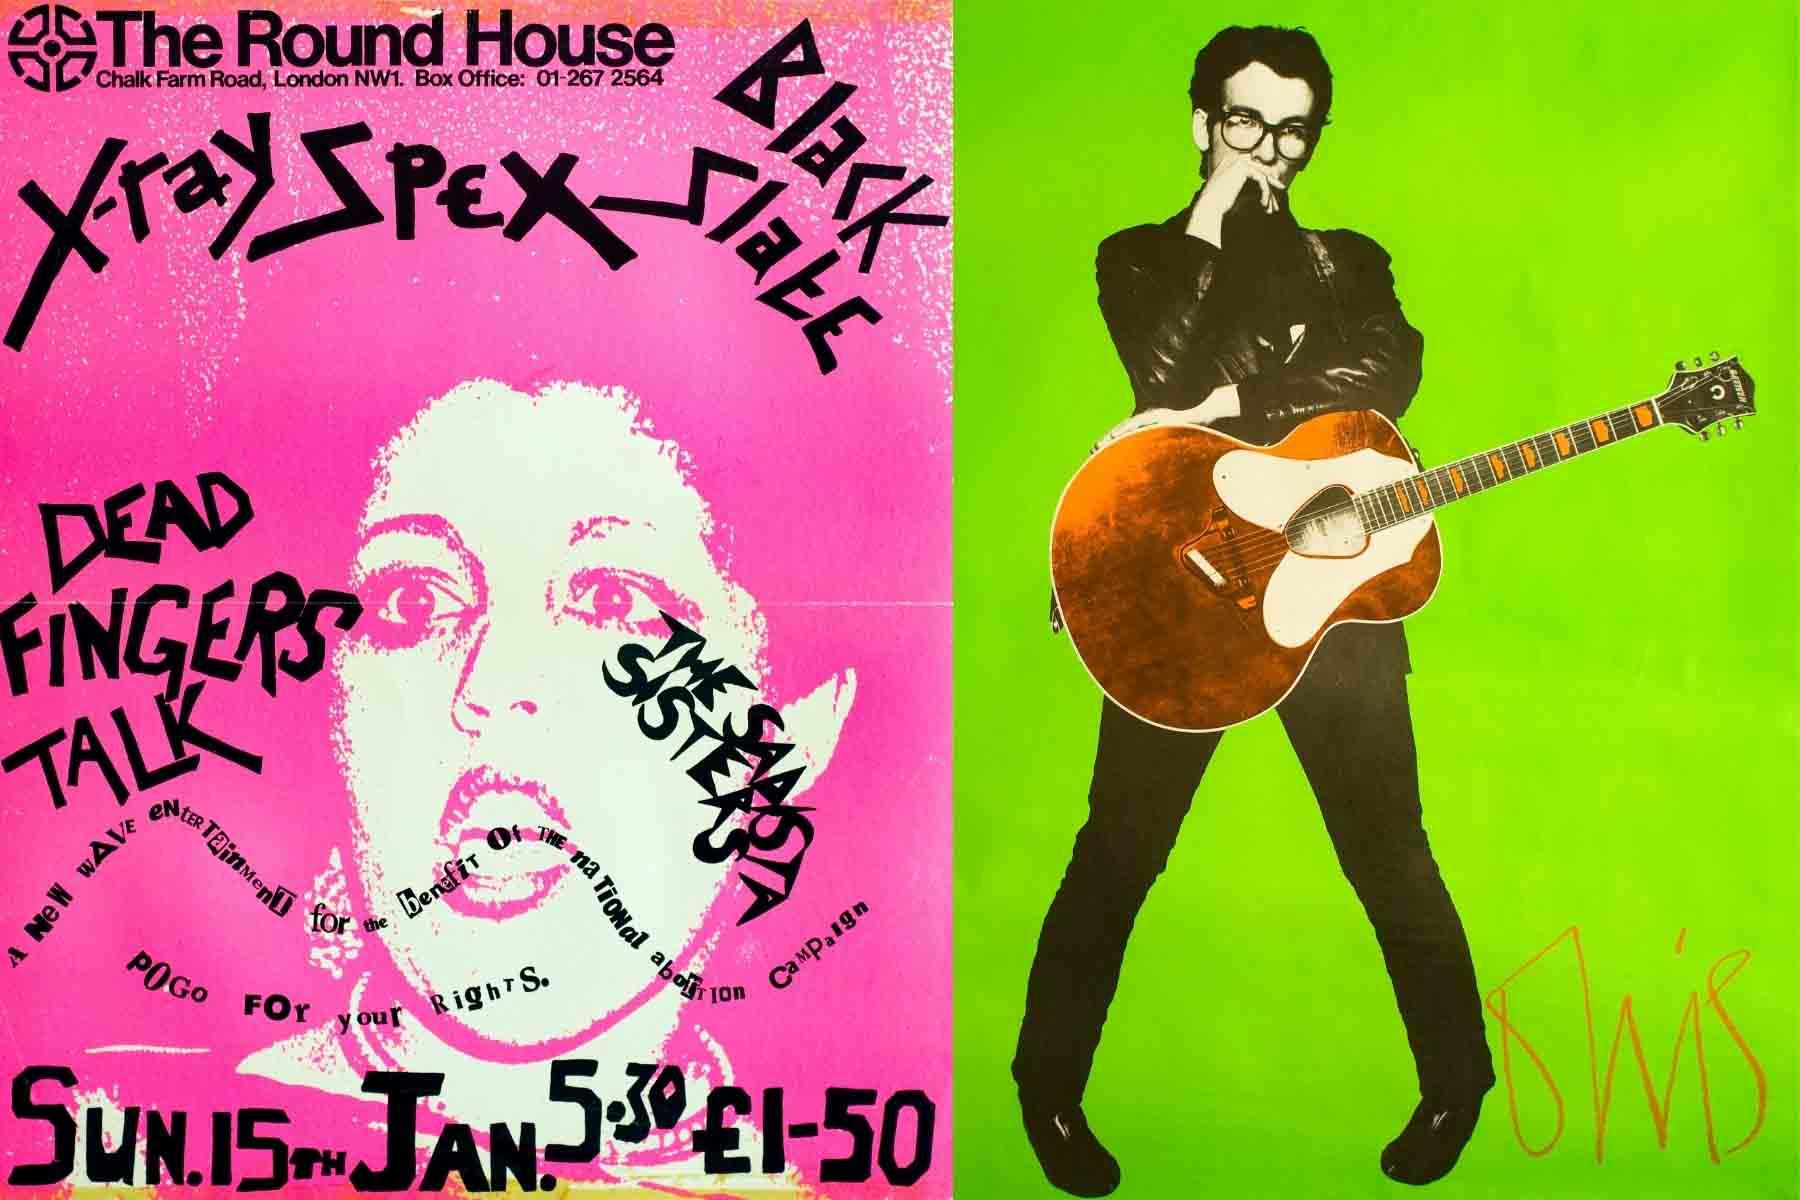 X-ray specs and Elvis Costello